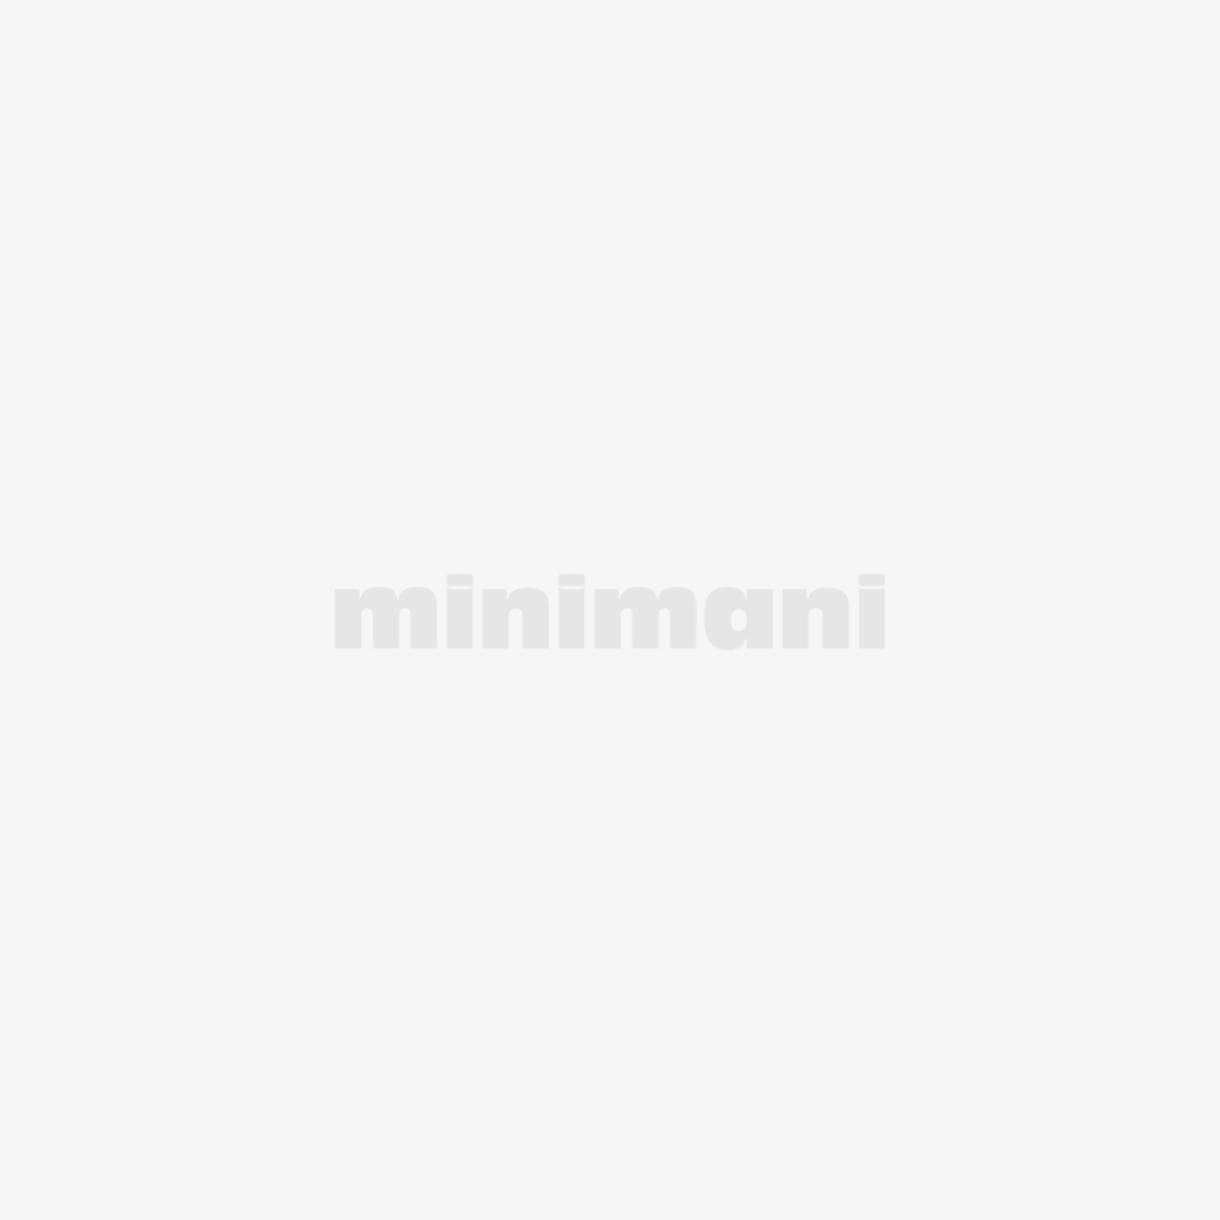 Vallila valmisverho 140x240cm, Sulka black-out musta